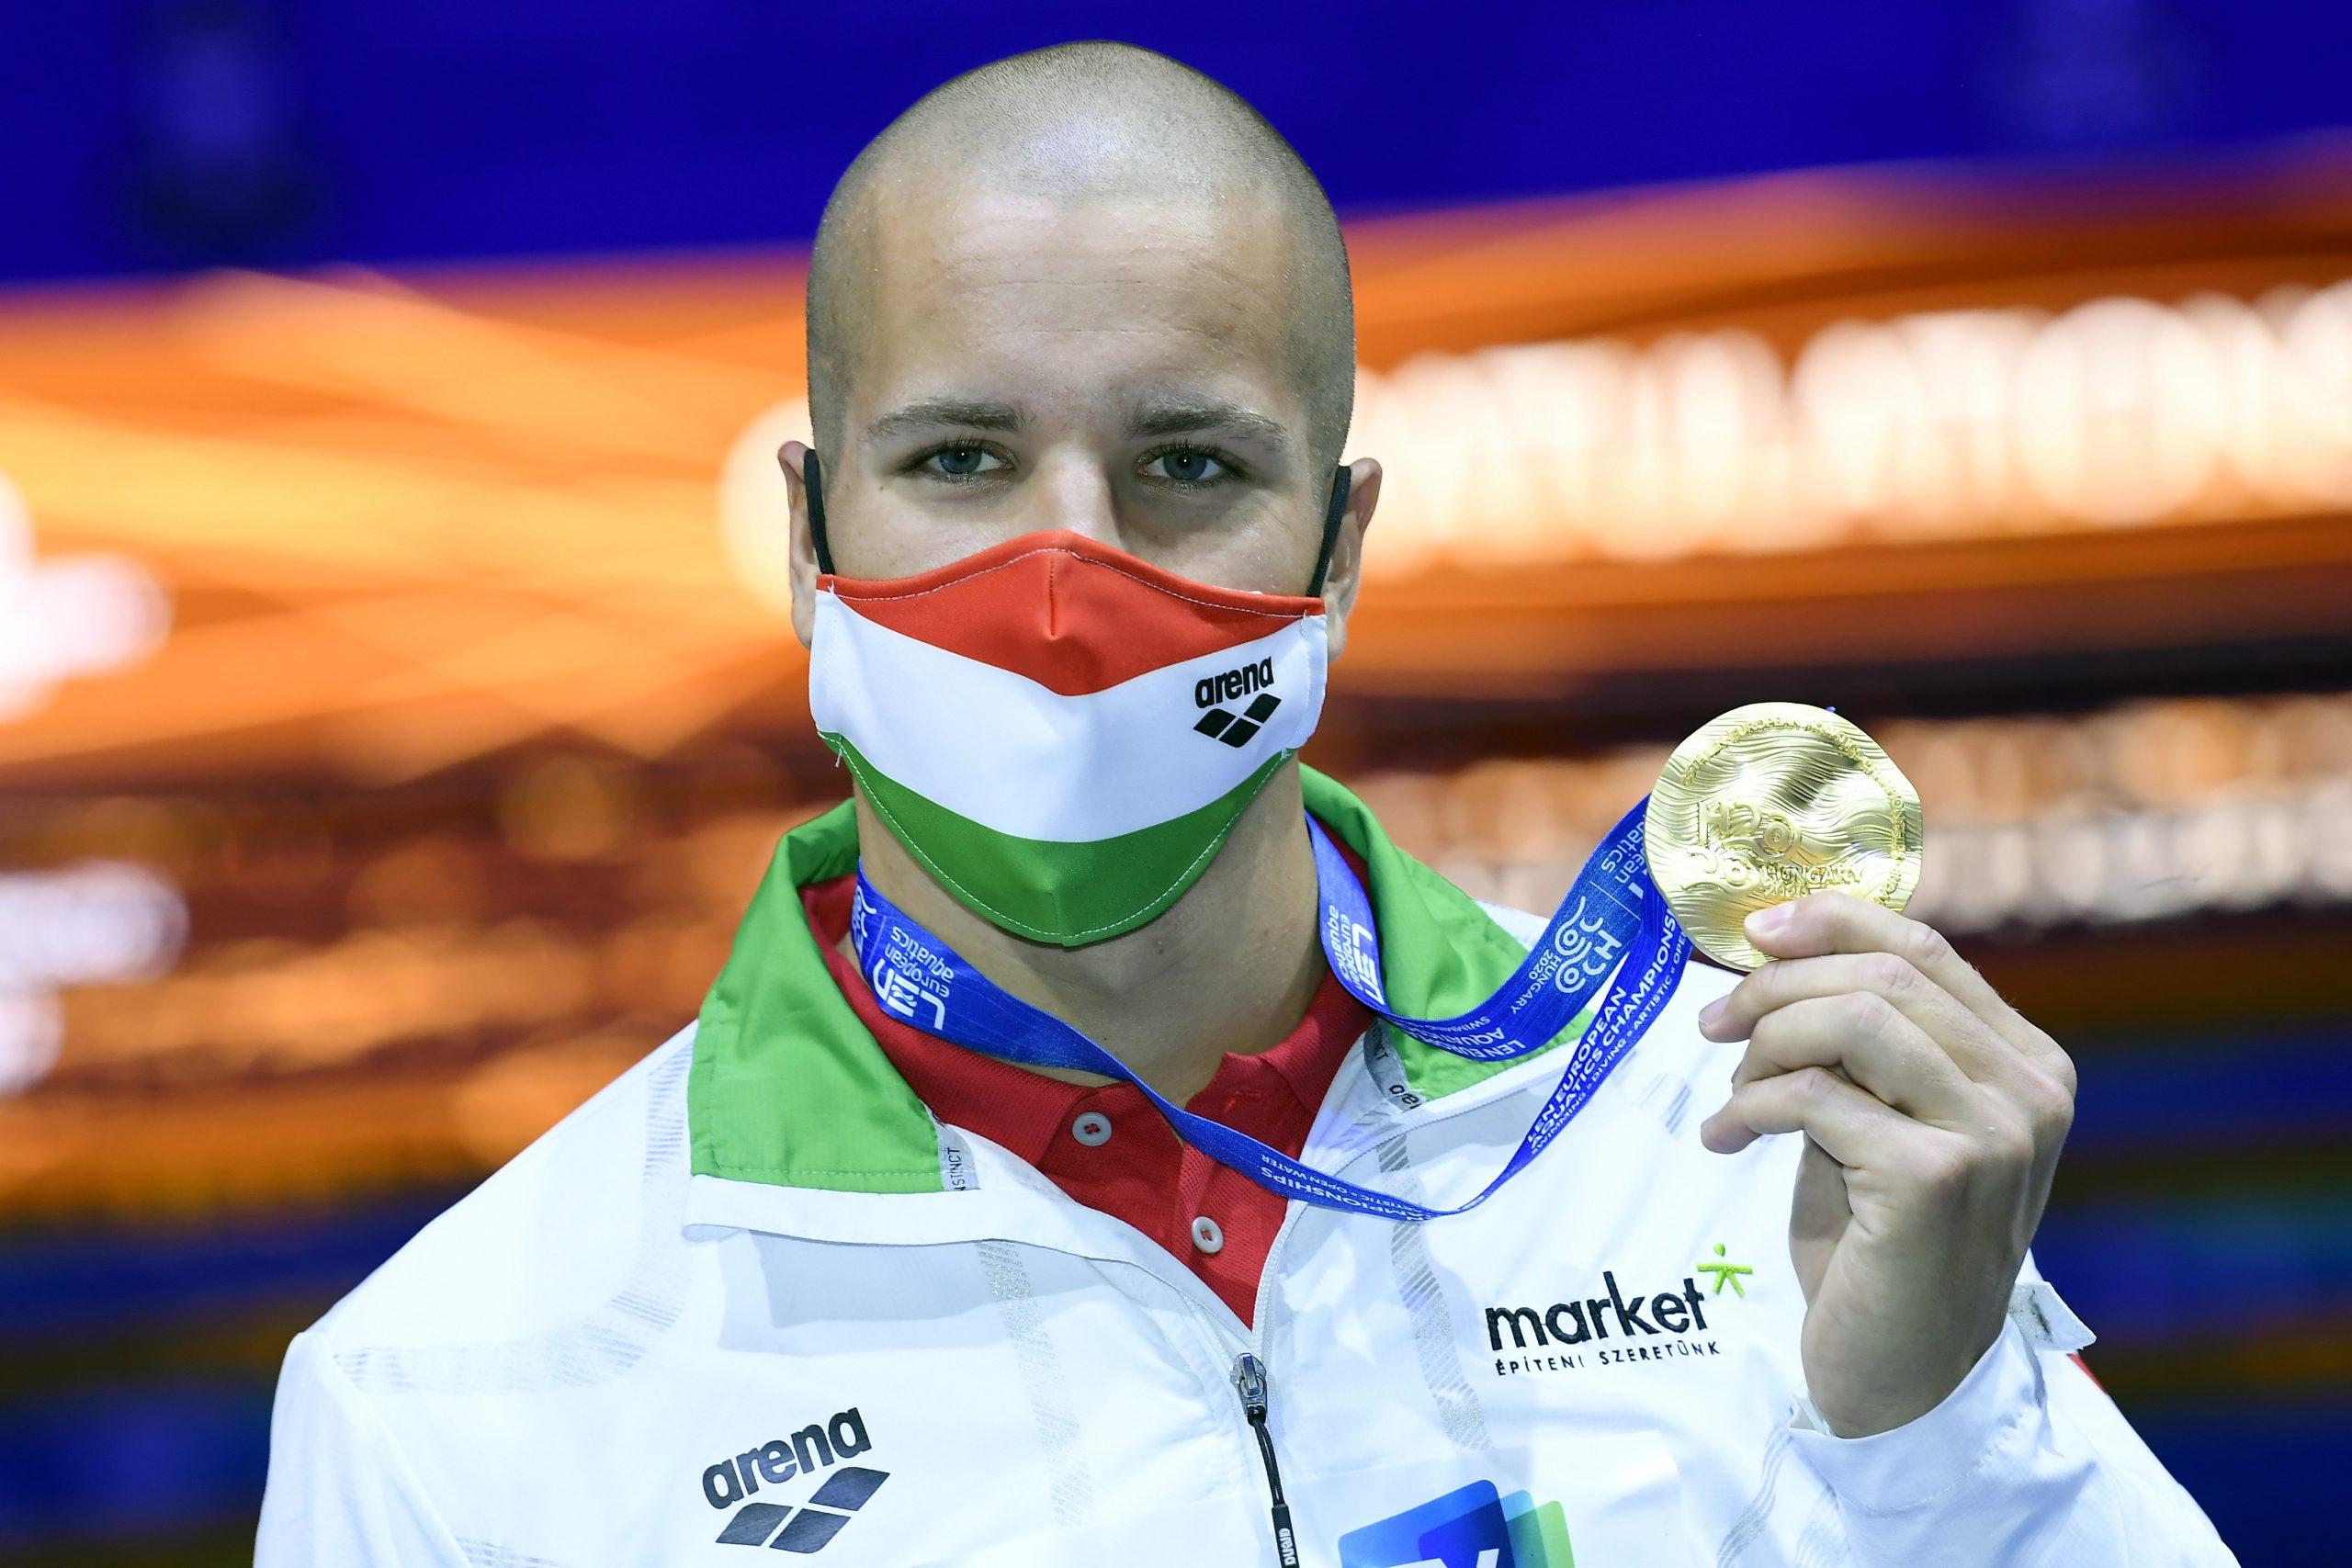 Szabó Wins 50-Meter Butterfly at European Aquatics Championships